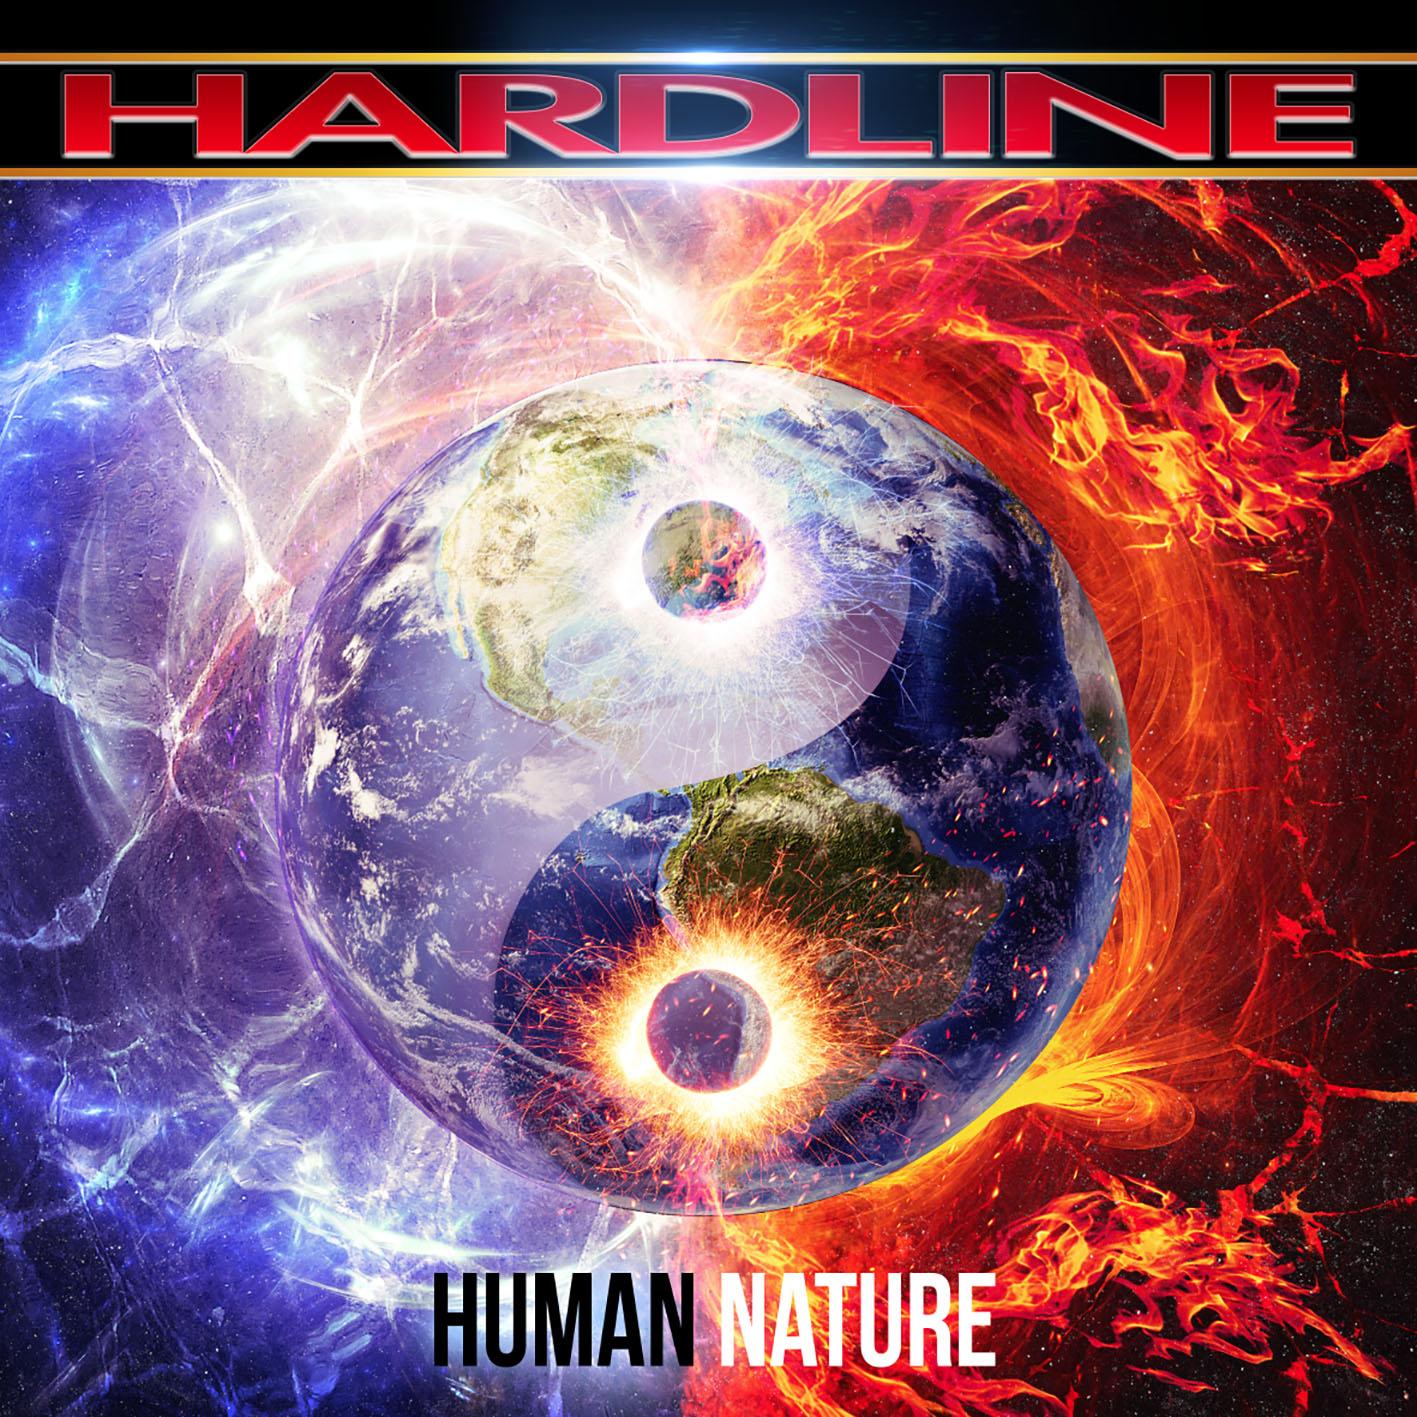 Hardline-Human Nature cover